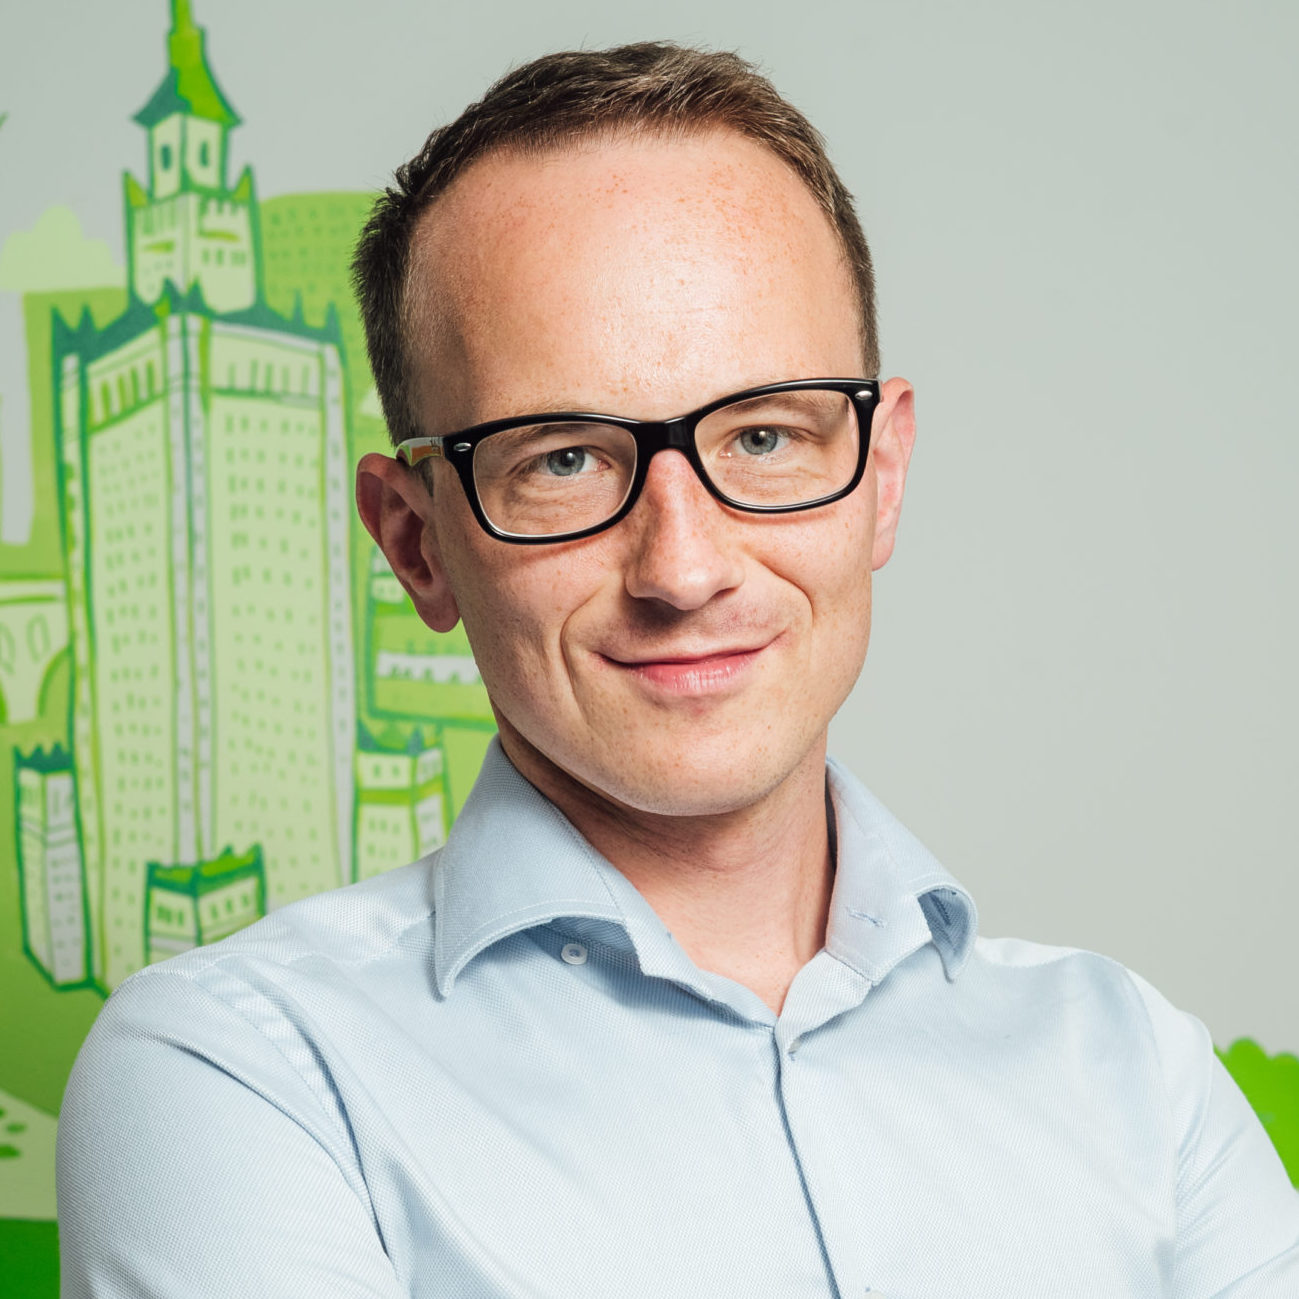 Marcin Chlewicki